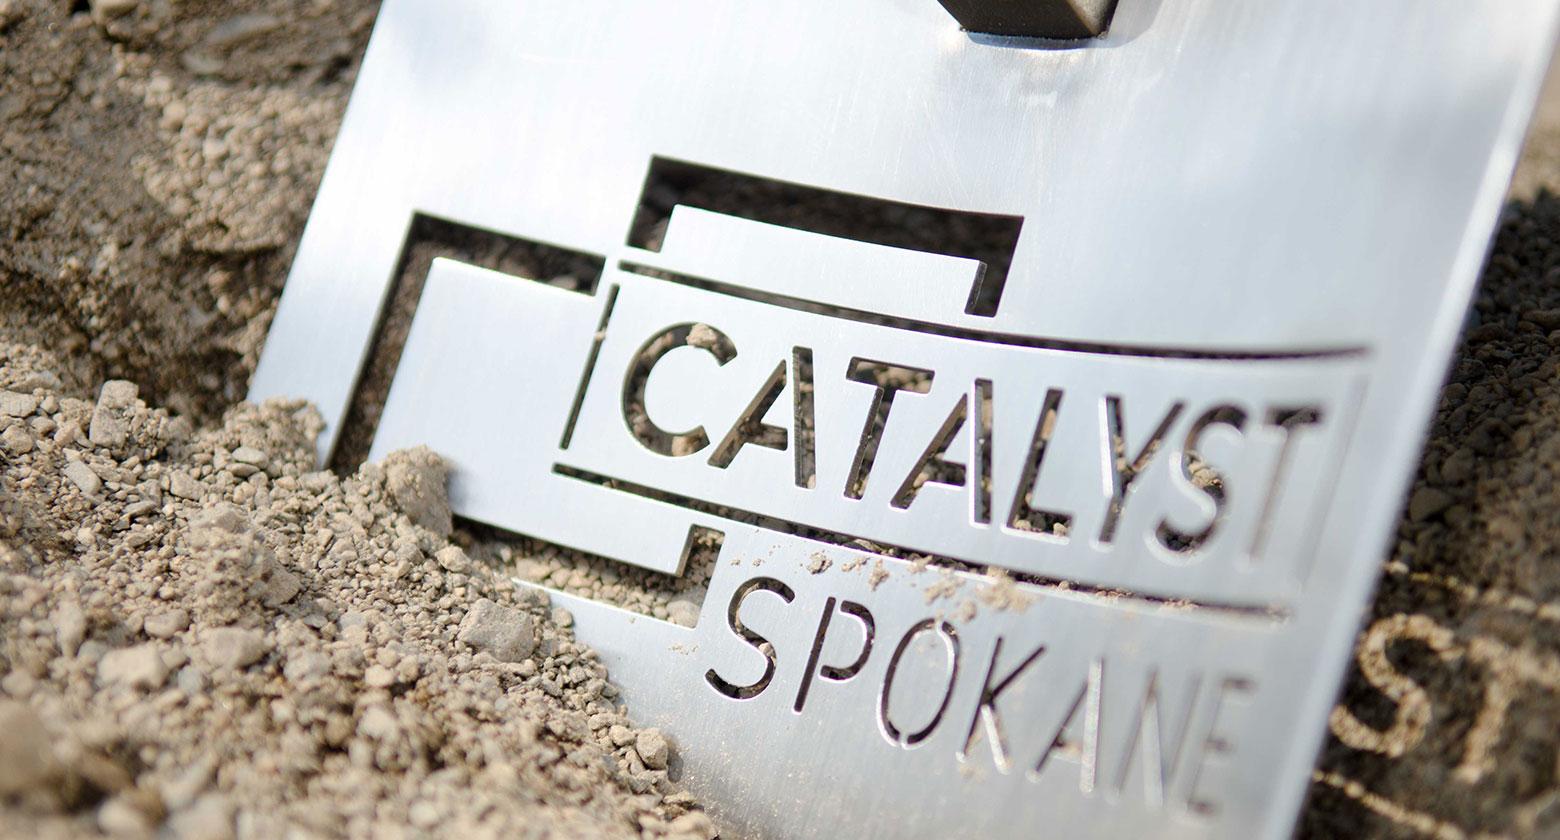 New building, partnership a catalyst for EWU growth in Spokane